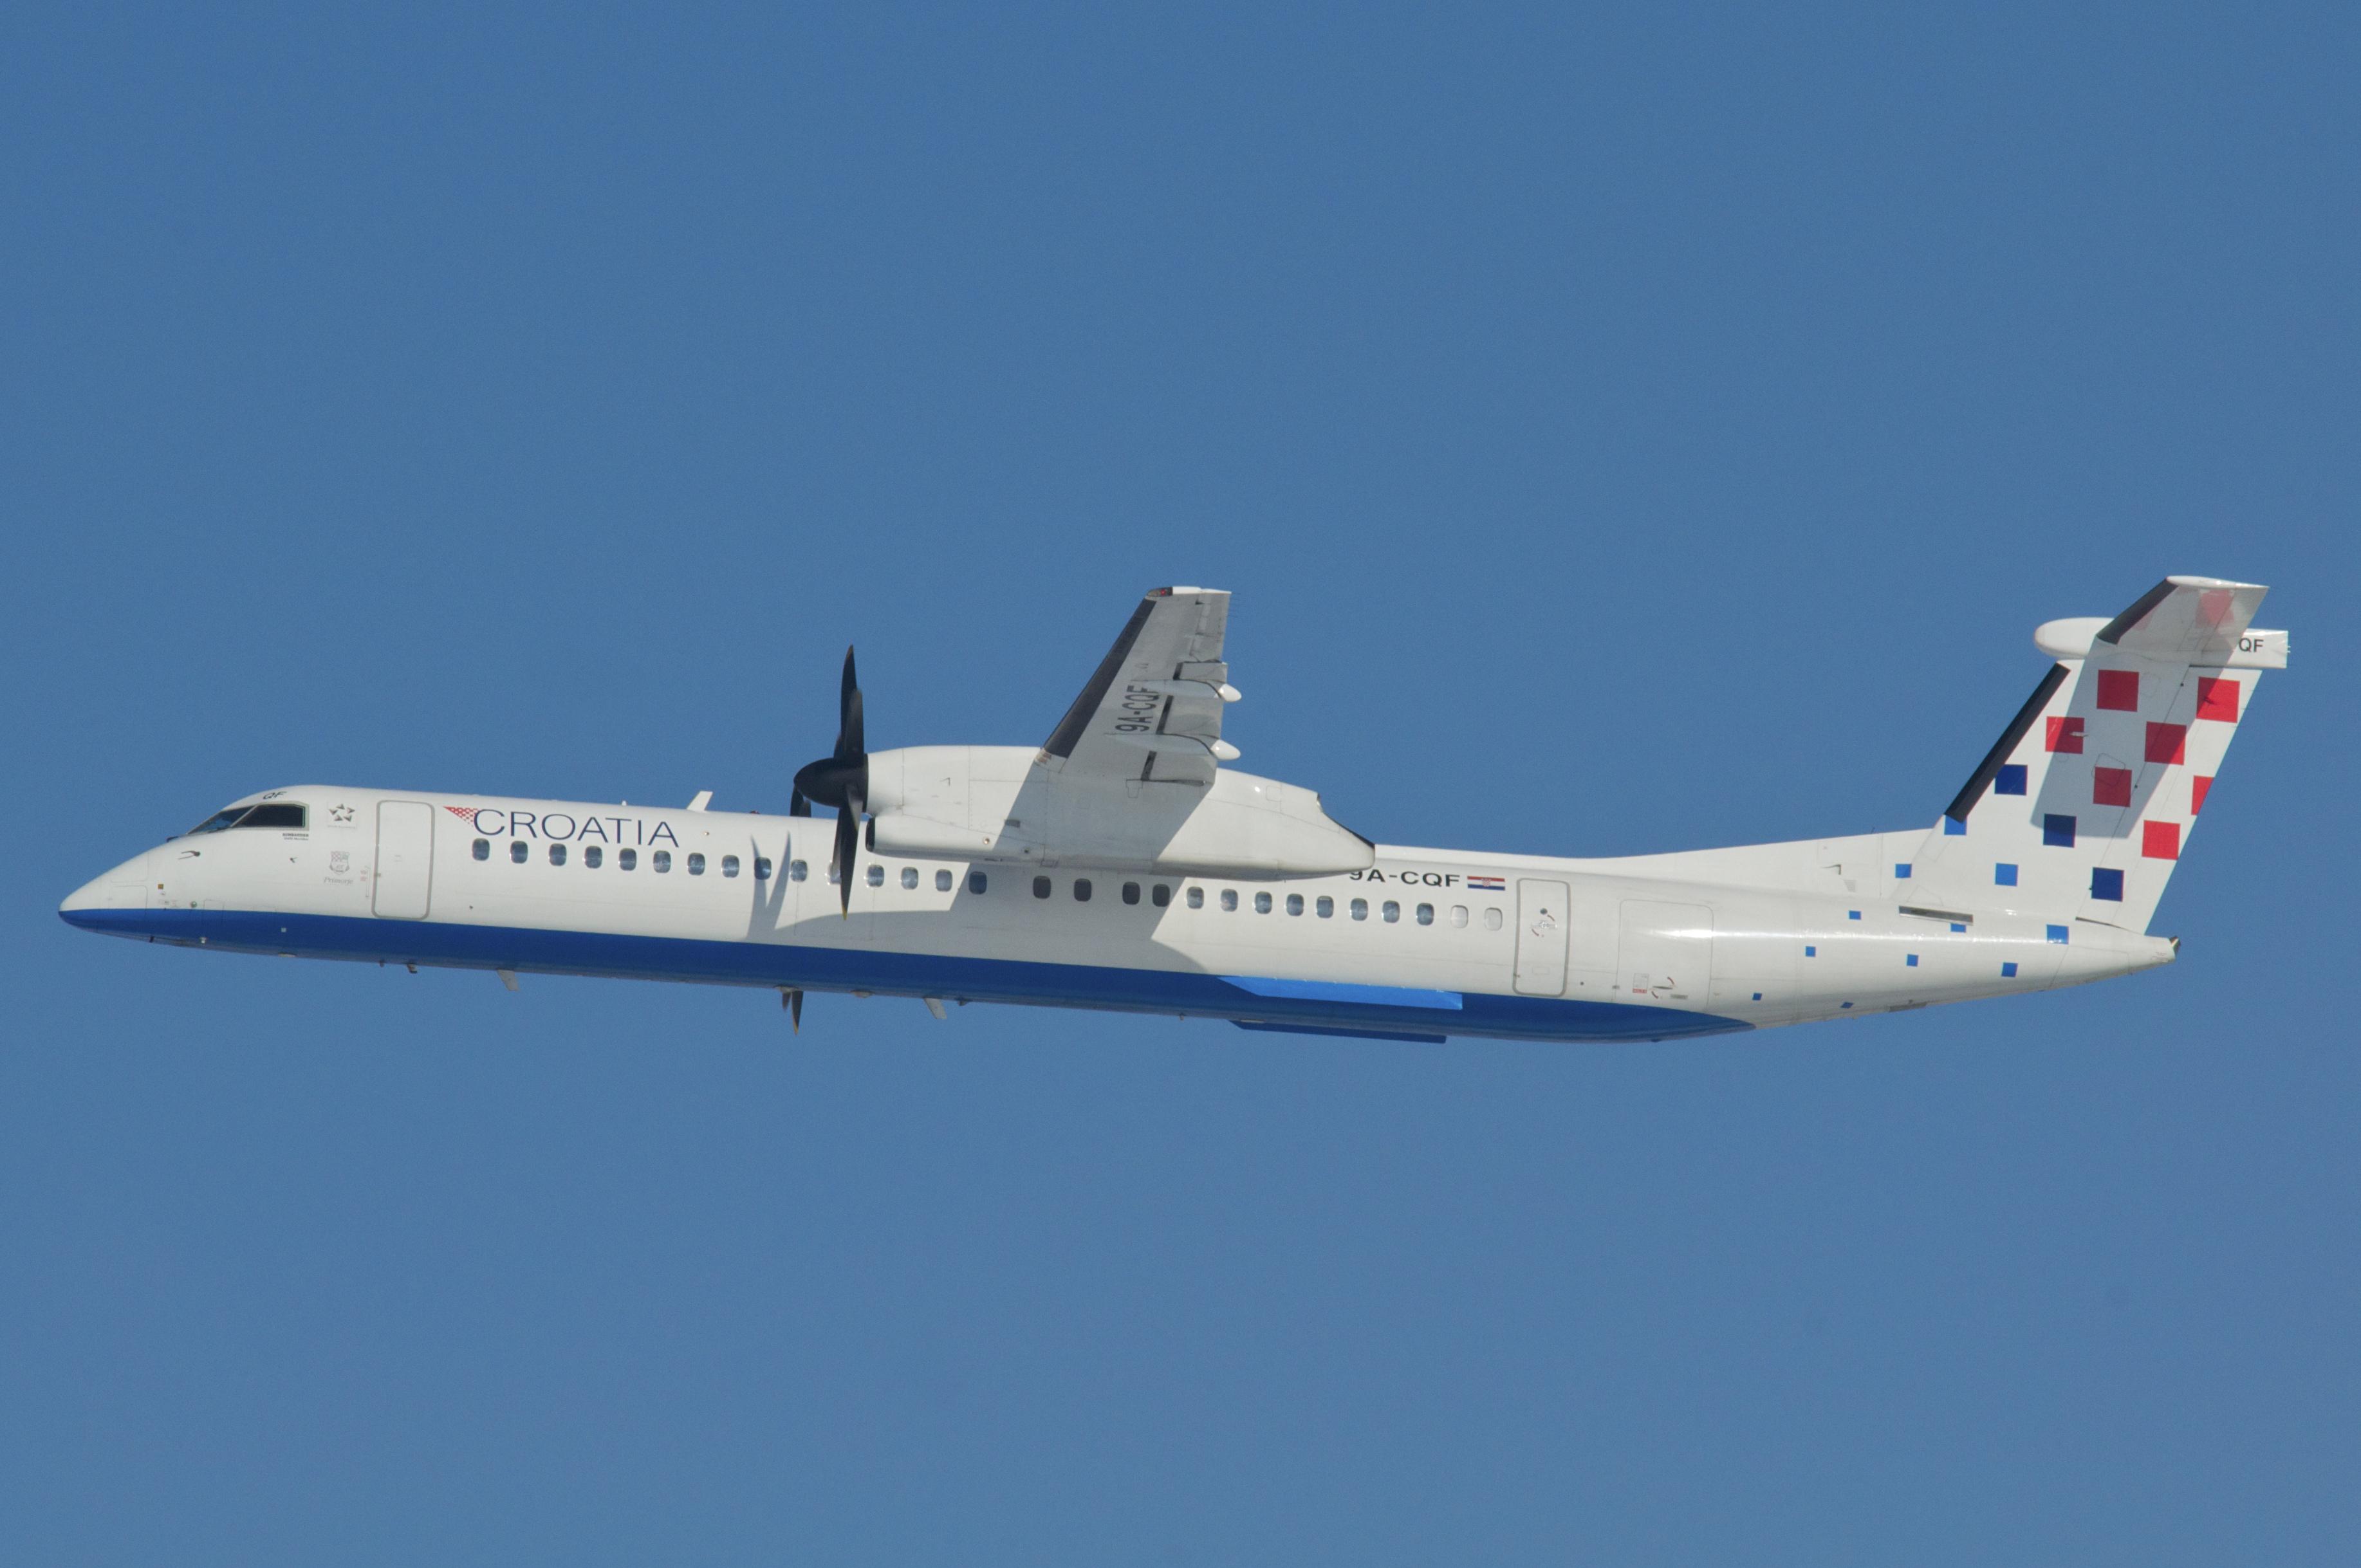 File:Croatia Airlines DHC-8-400 Dash 8